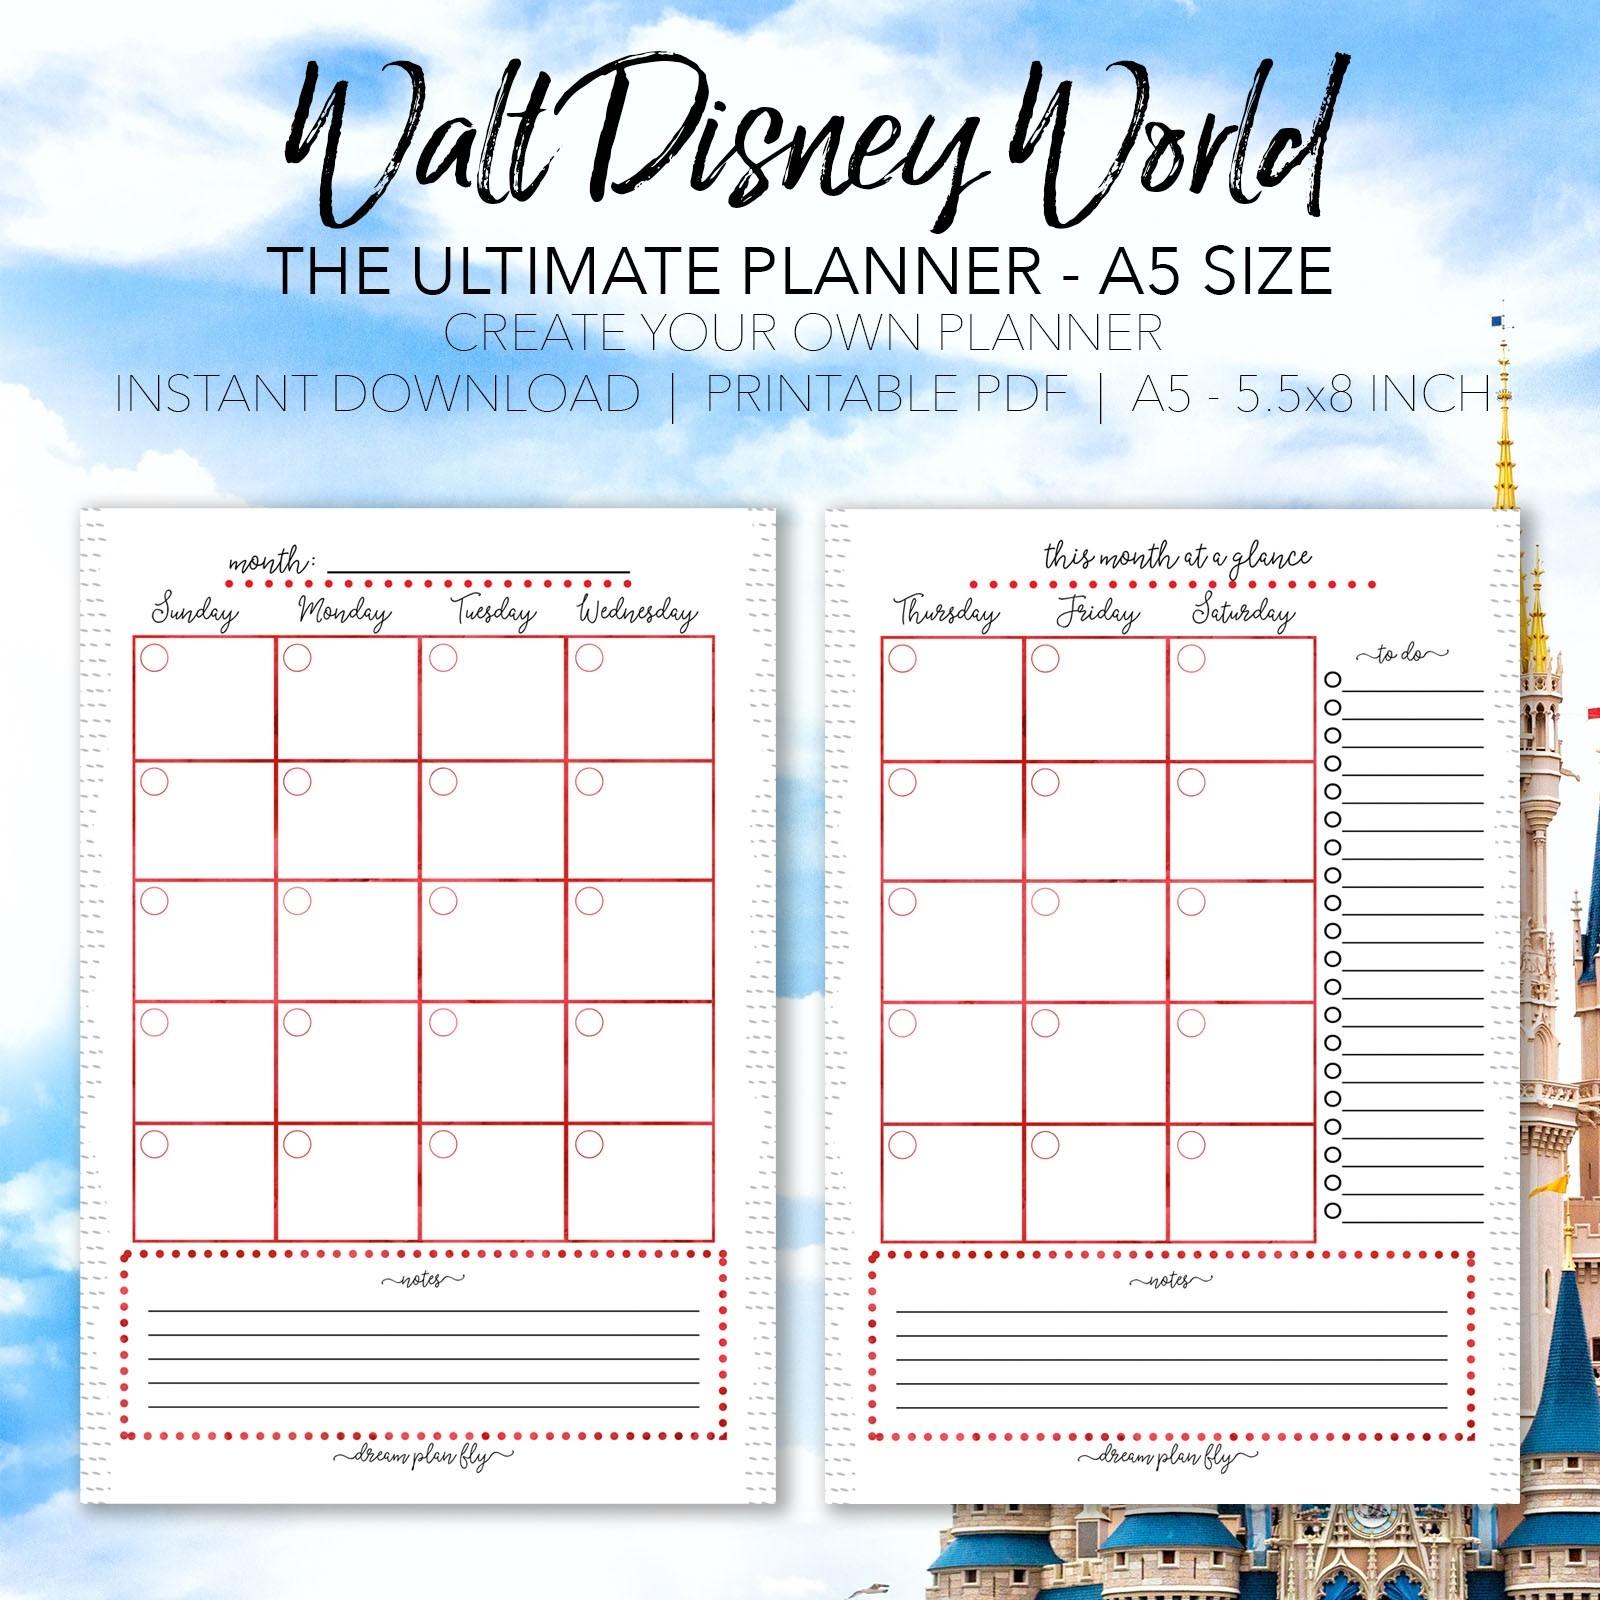 Vaction Planner - Wpa.wpart.co-Disney World Word Document Template